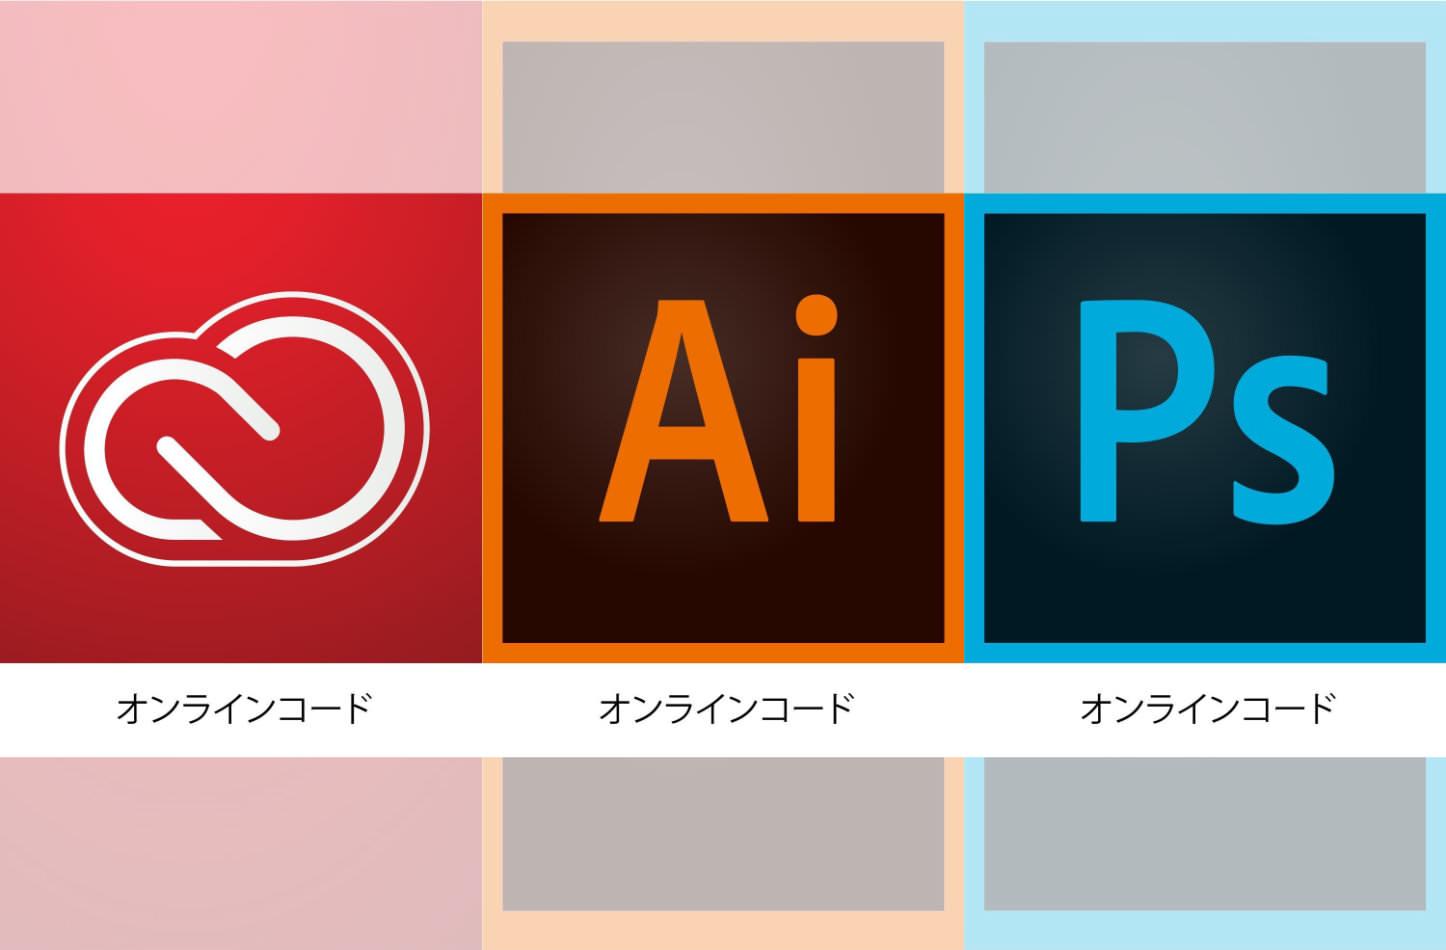 【20%OFF】 Adobe Creative Cloud 特別価格キャンペーン